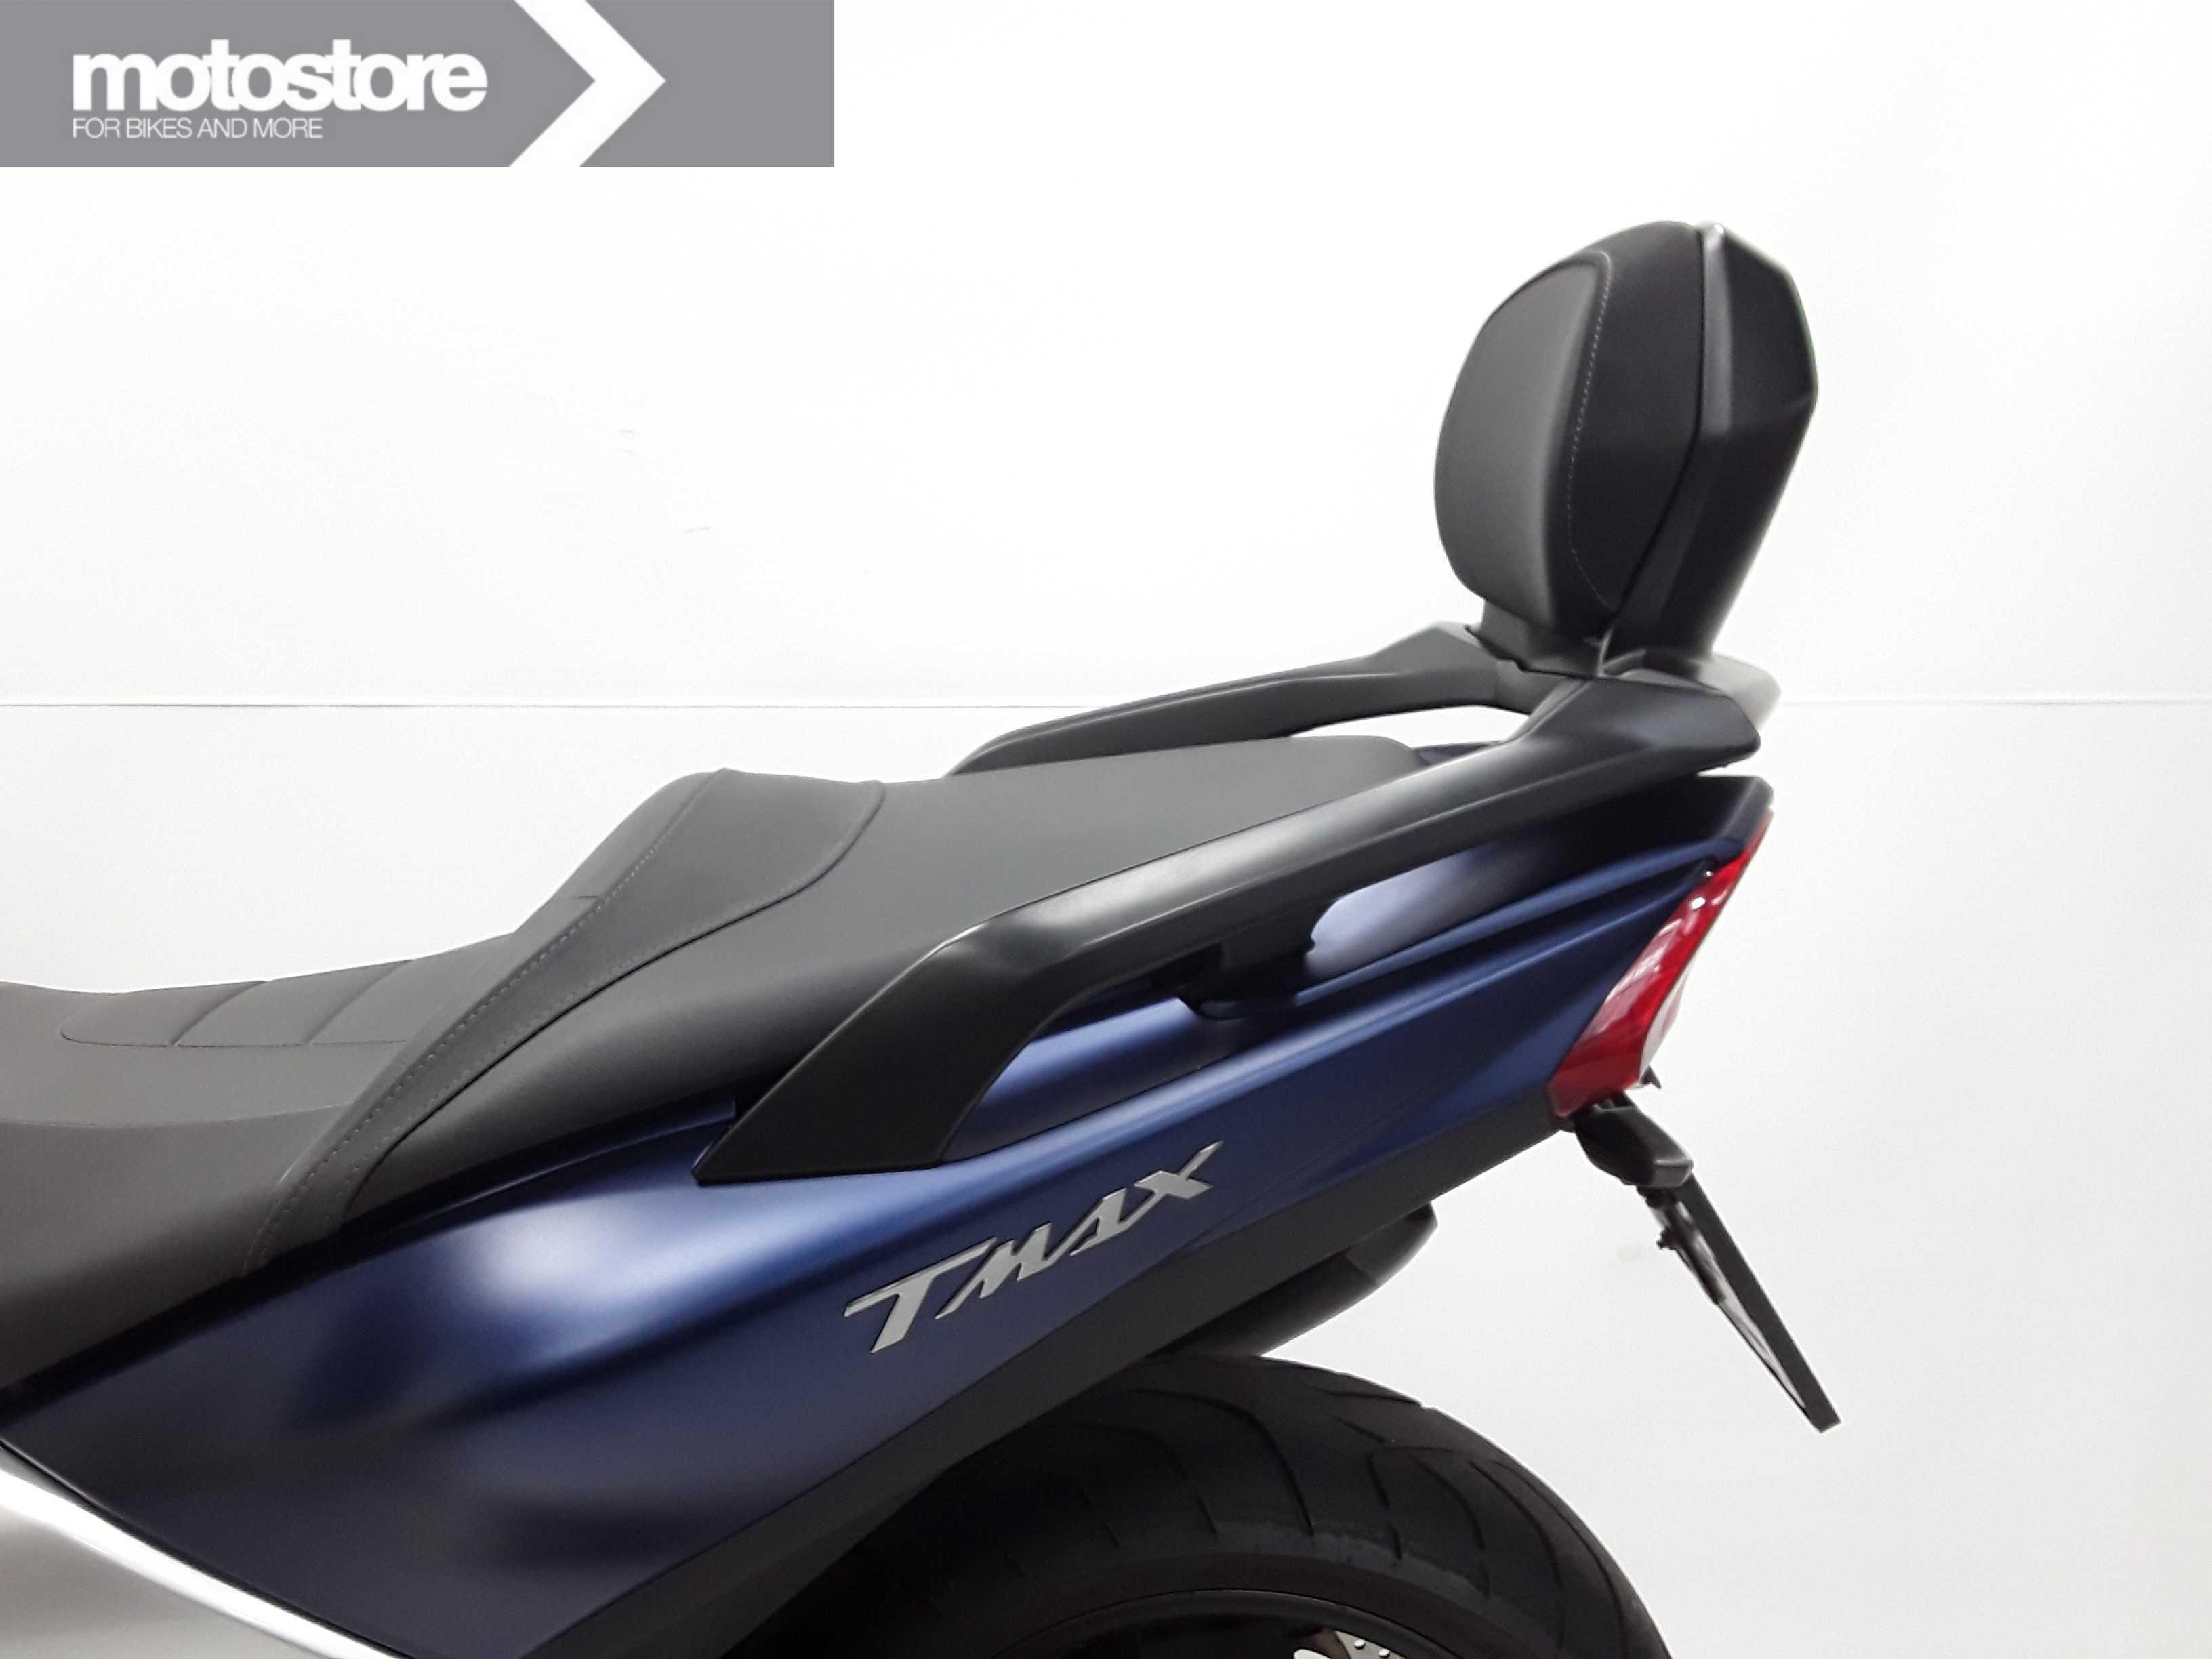 YAMAHA - T-MAX 530 DX